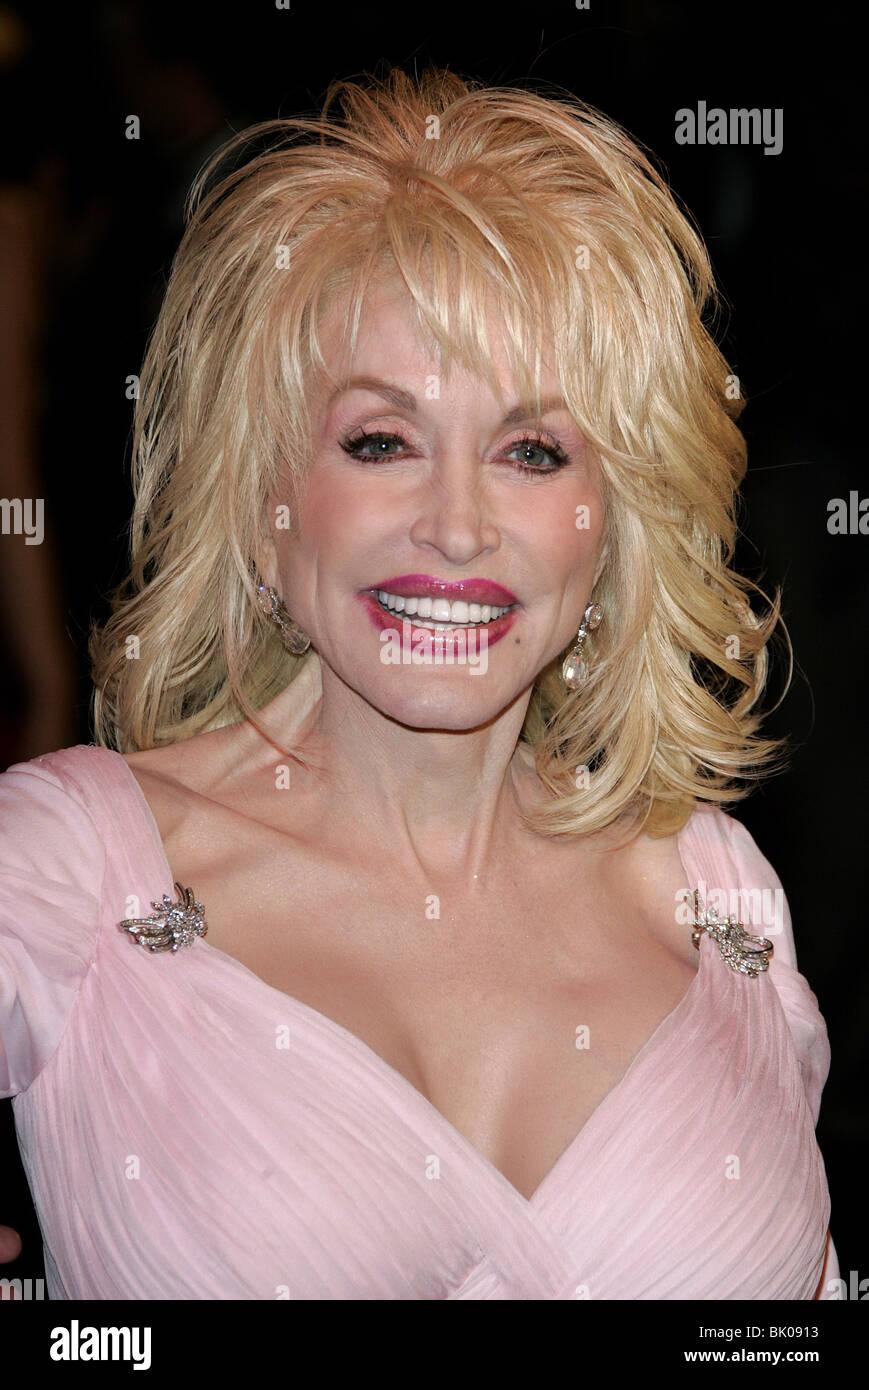 Dolly Parton Without Makeup And Wig Mugeek Vidalondon